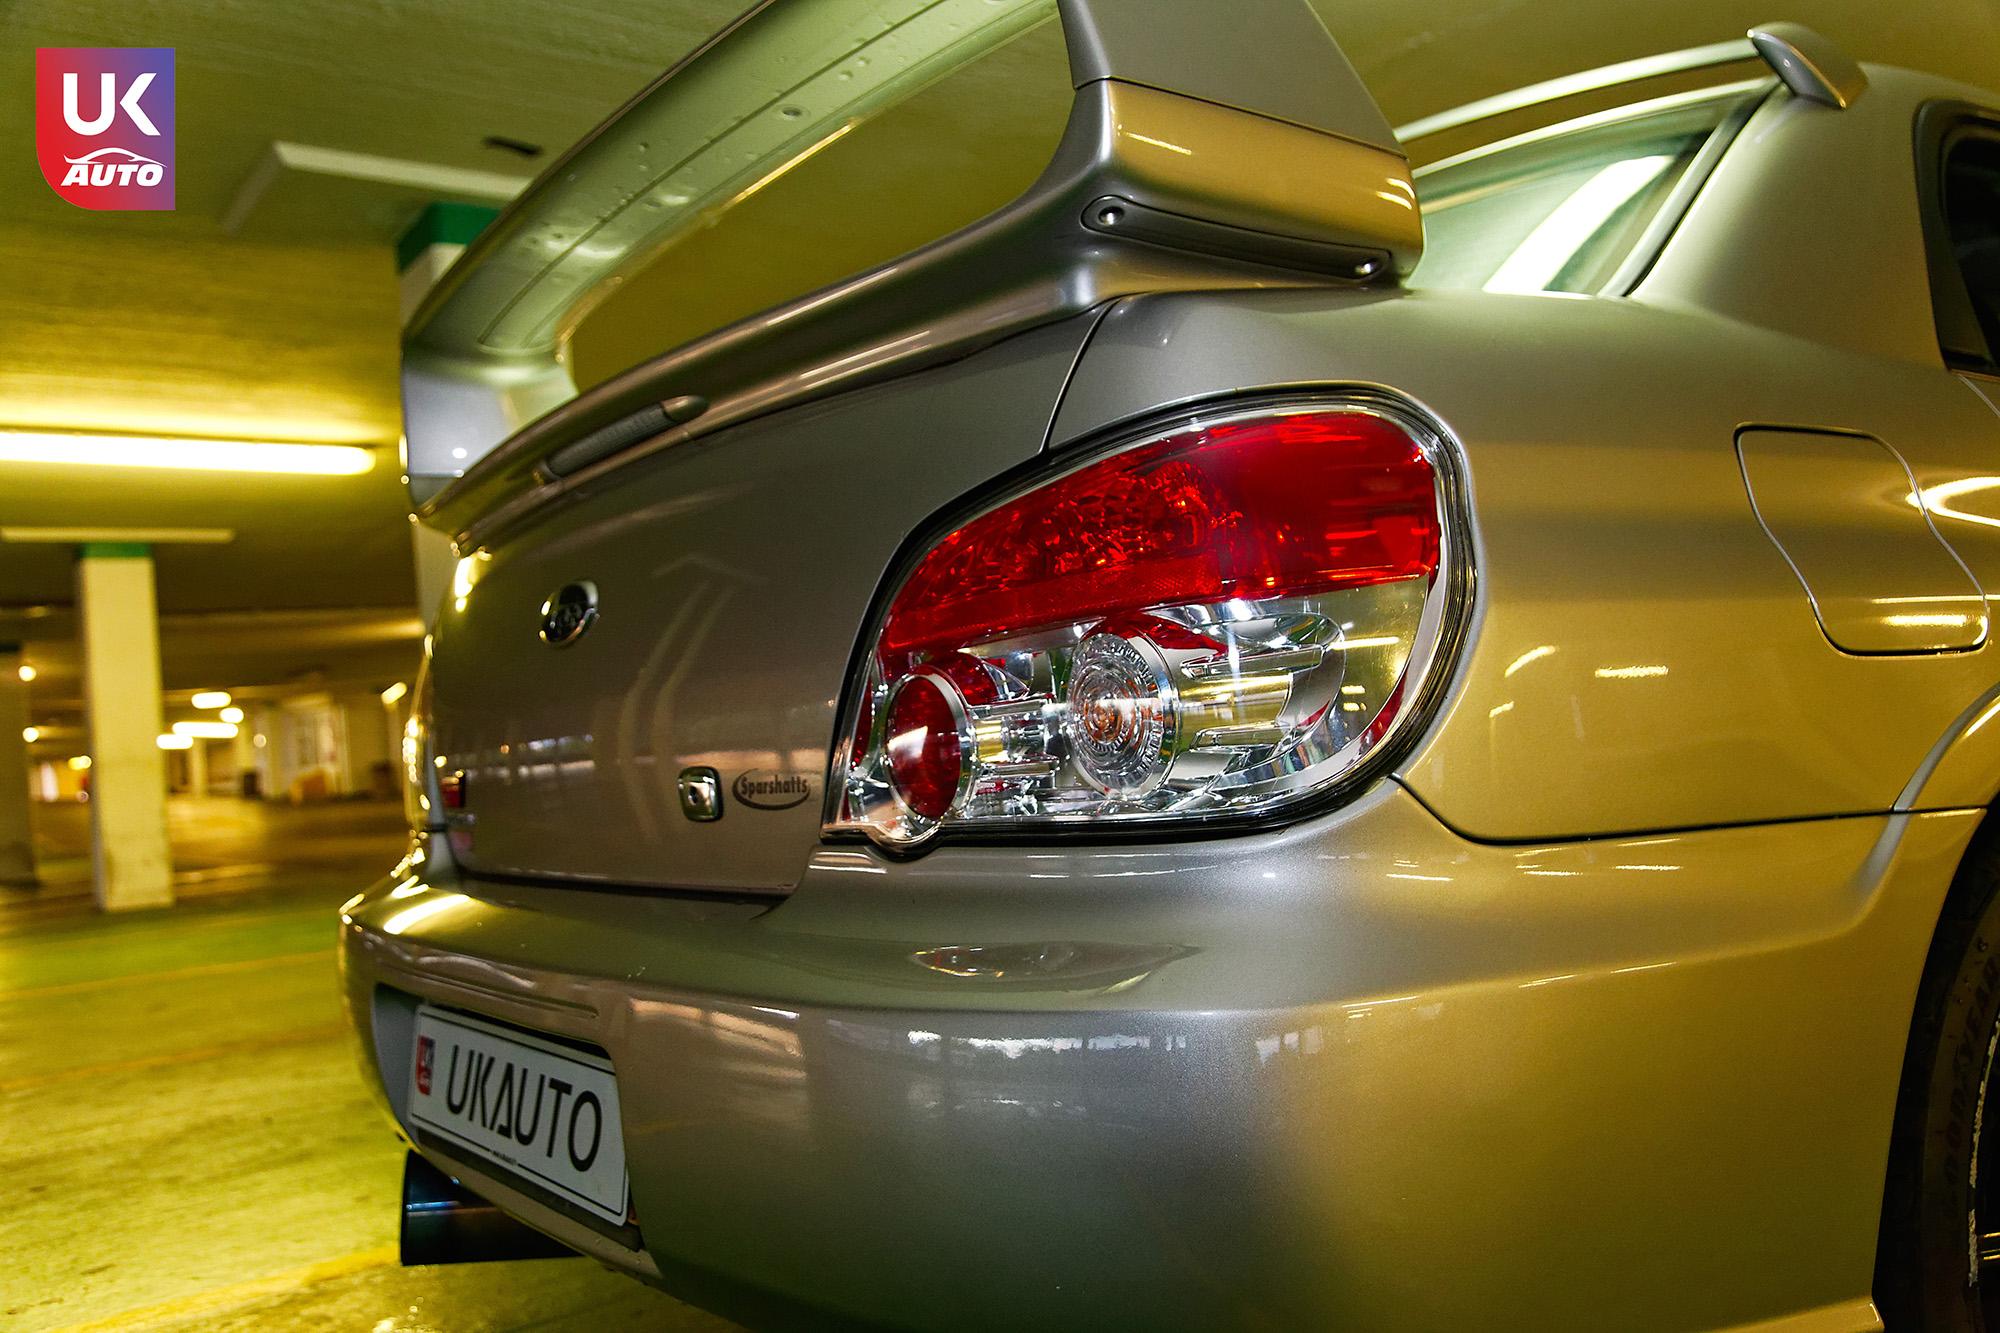 import subaru impreza wrx sti rhd import voiture angleterre auto import1 - Felecitation a Christophe pour cette Subaru Impreza Wrx Sti RHD Supercharged Importation voiture angleterre